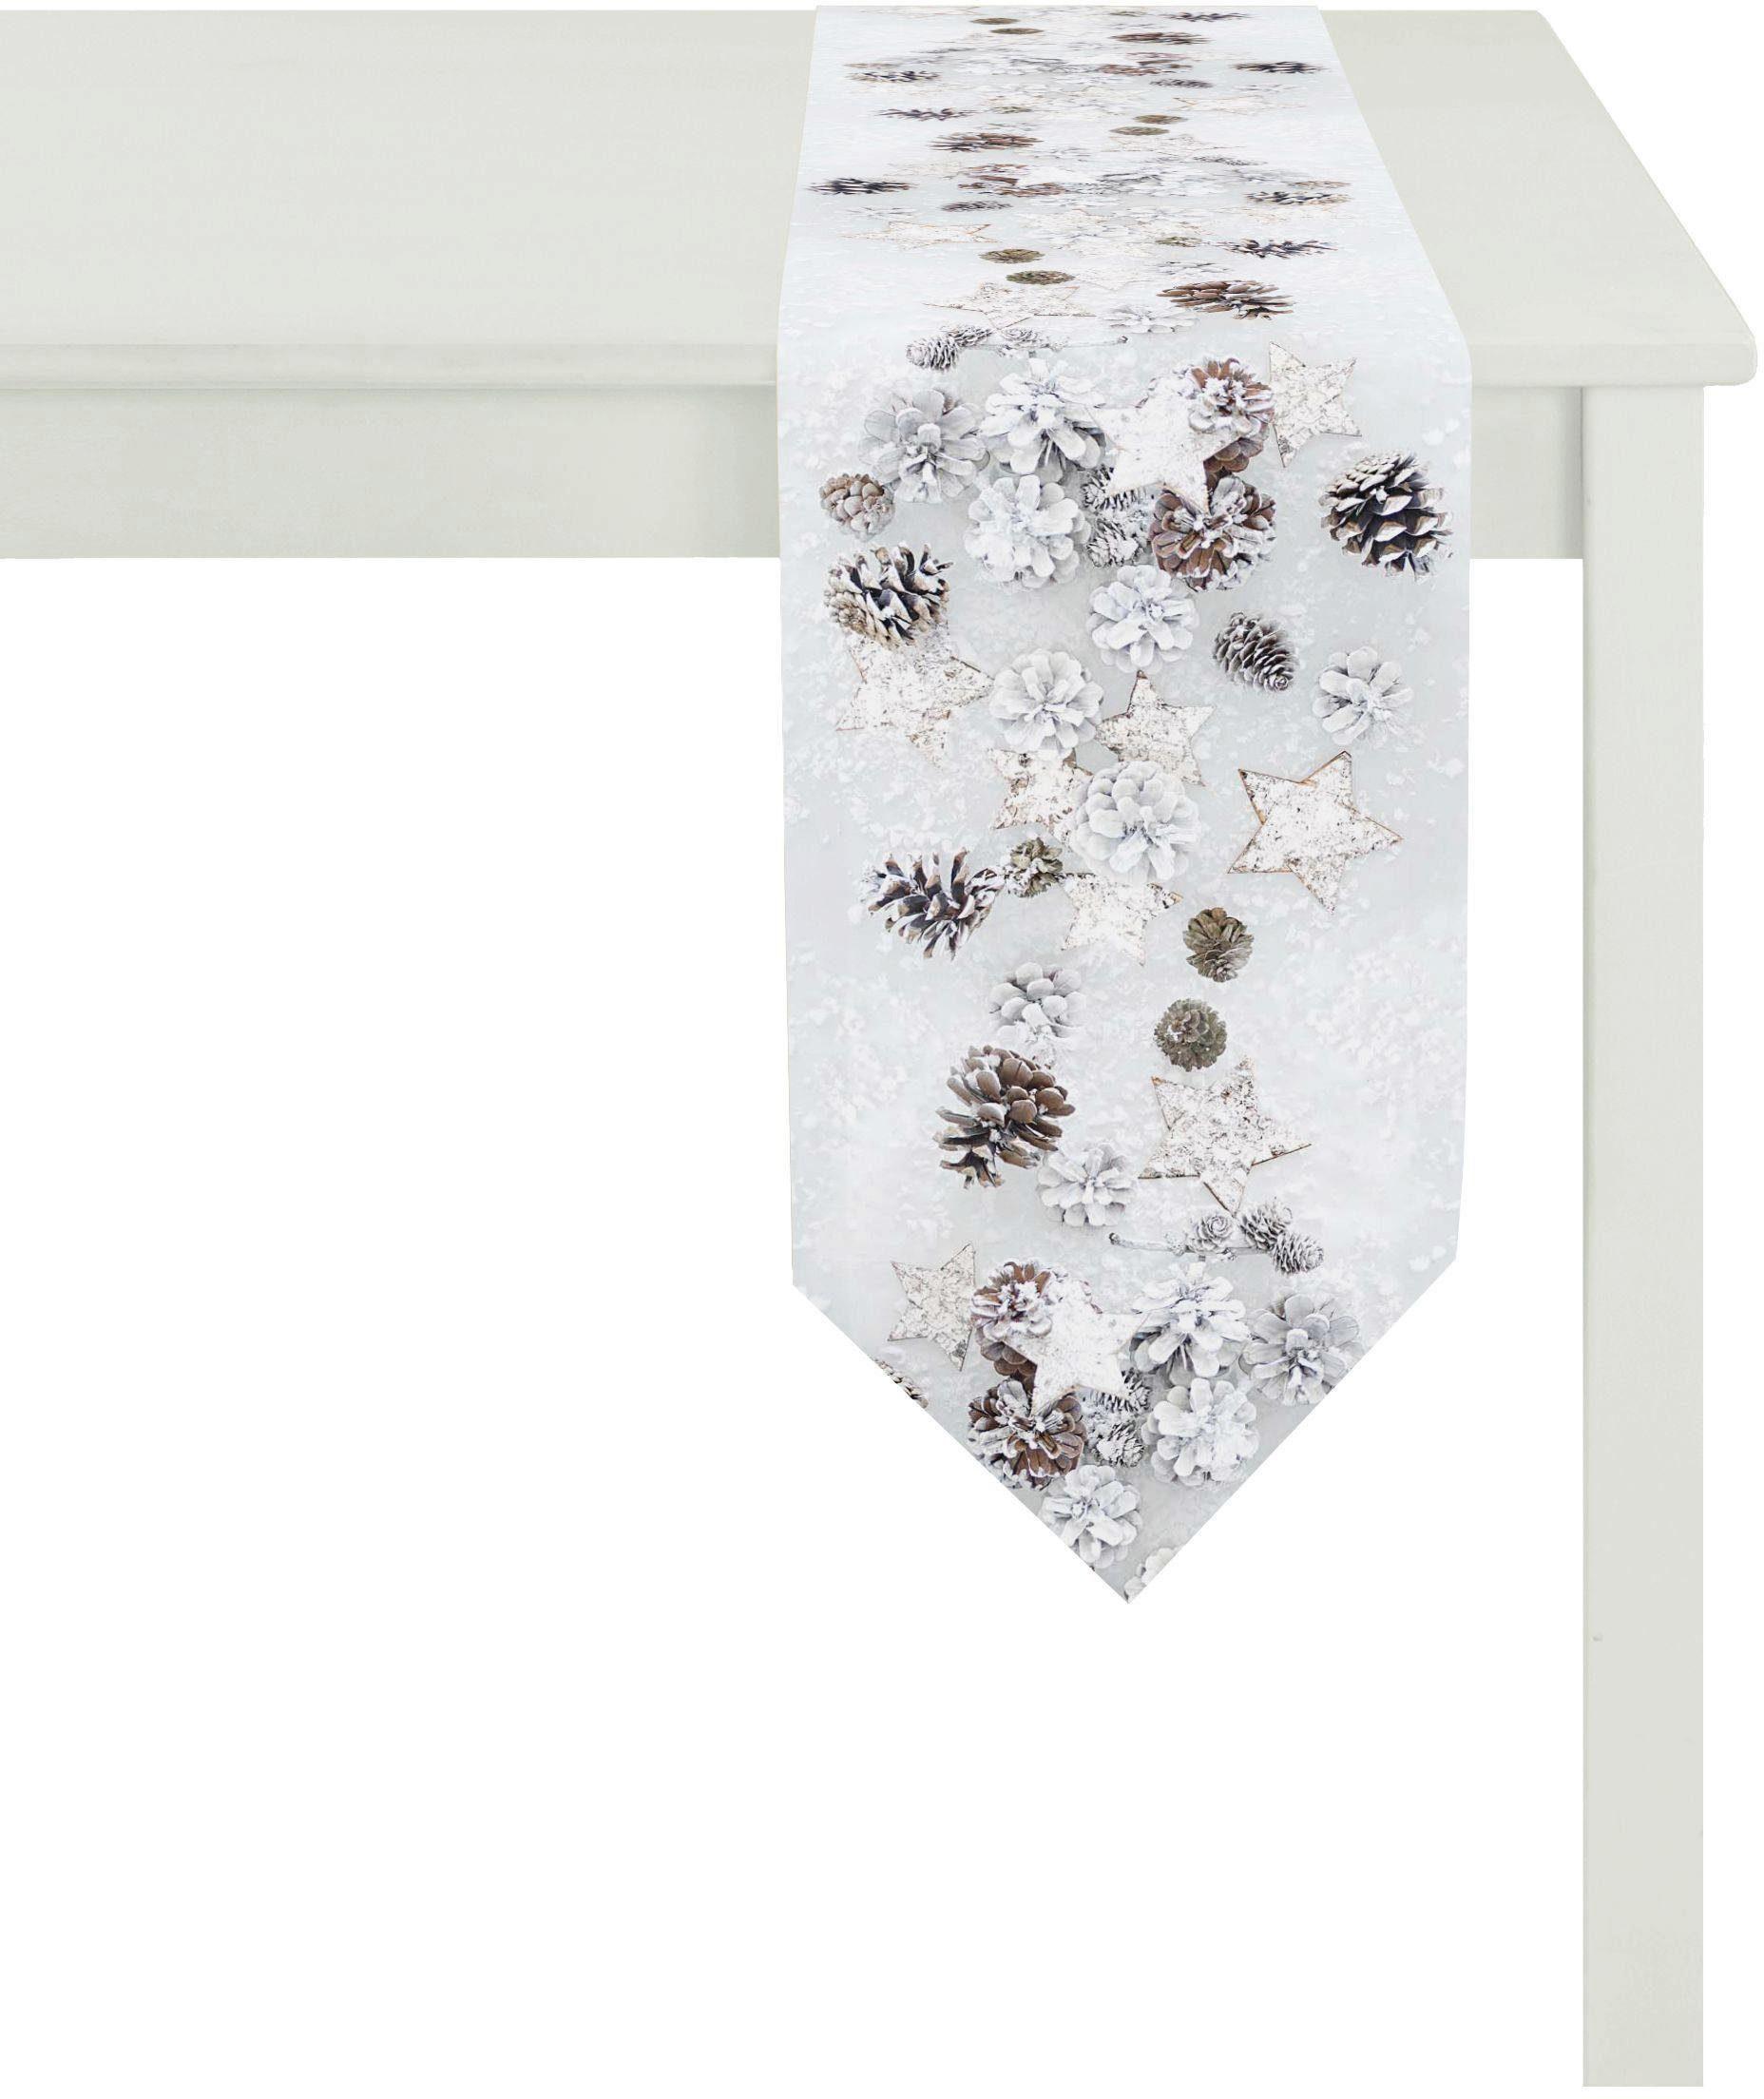 Apelt Apelt Tischband 25x175 cm, »4692 Winterwelt«